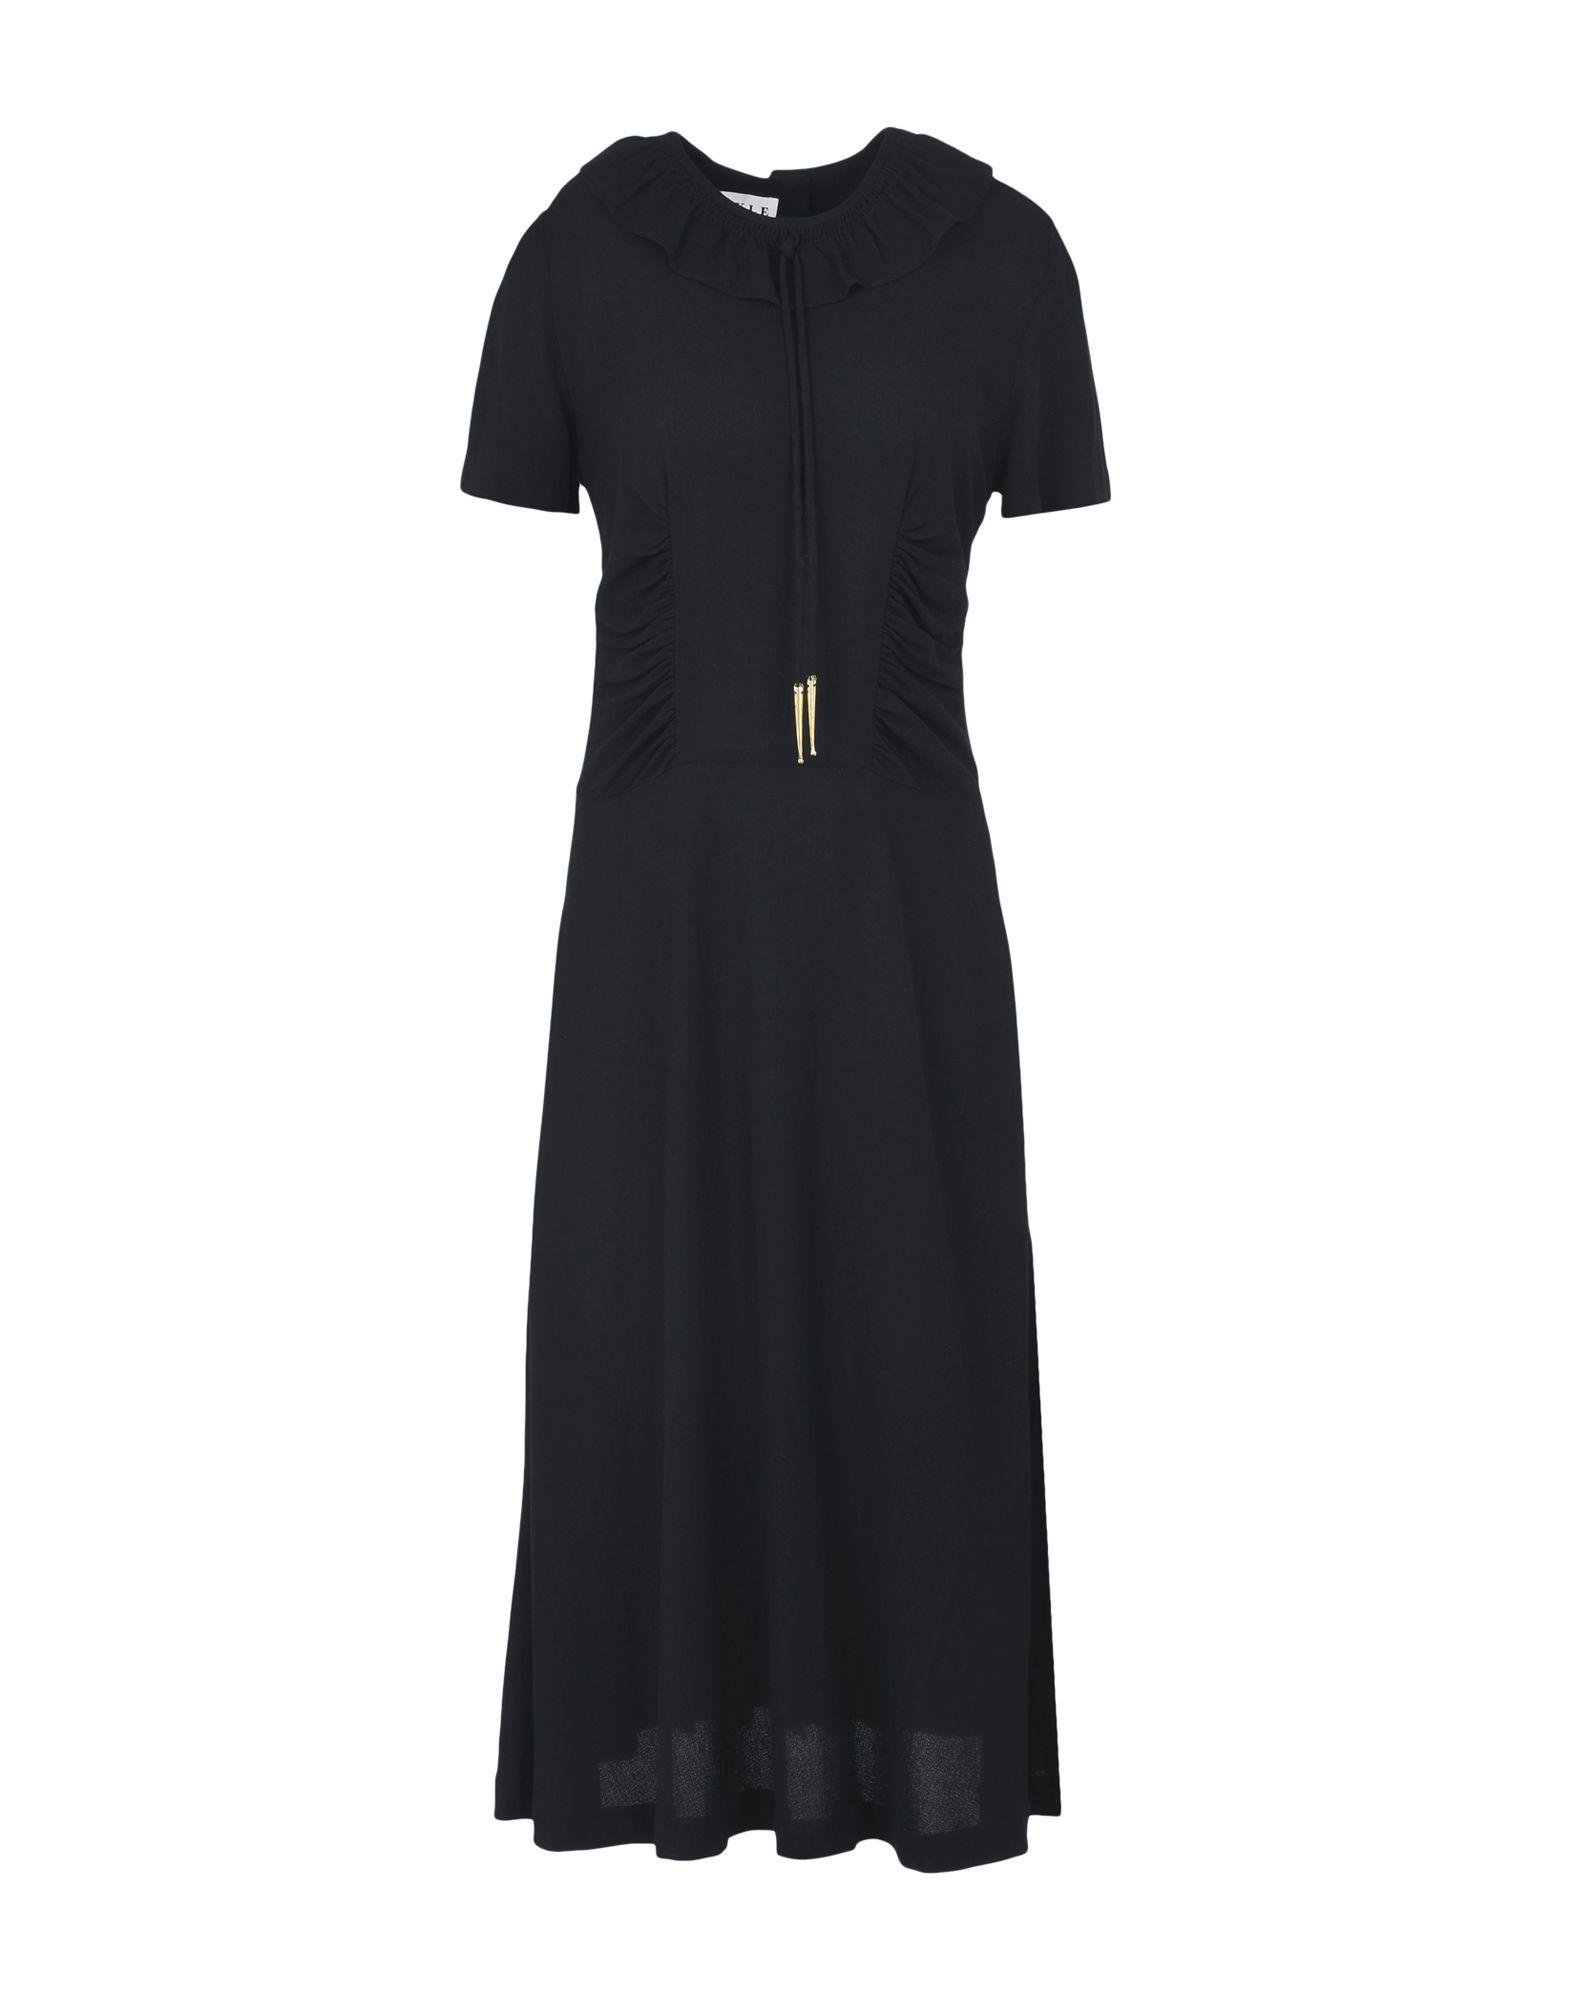 MAYLE Knee-Length Dress in Black